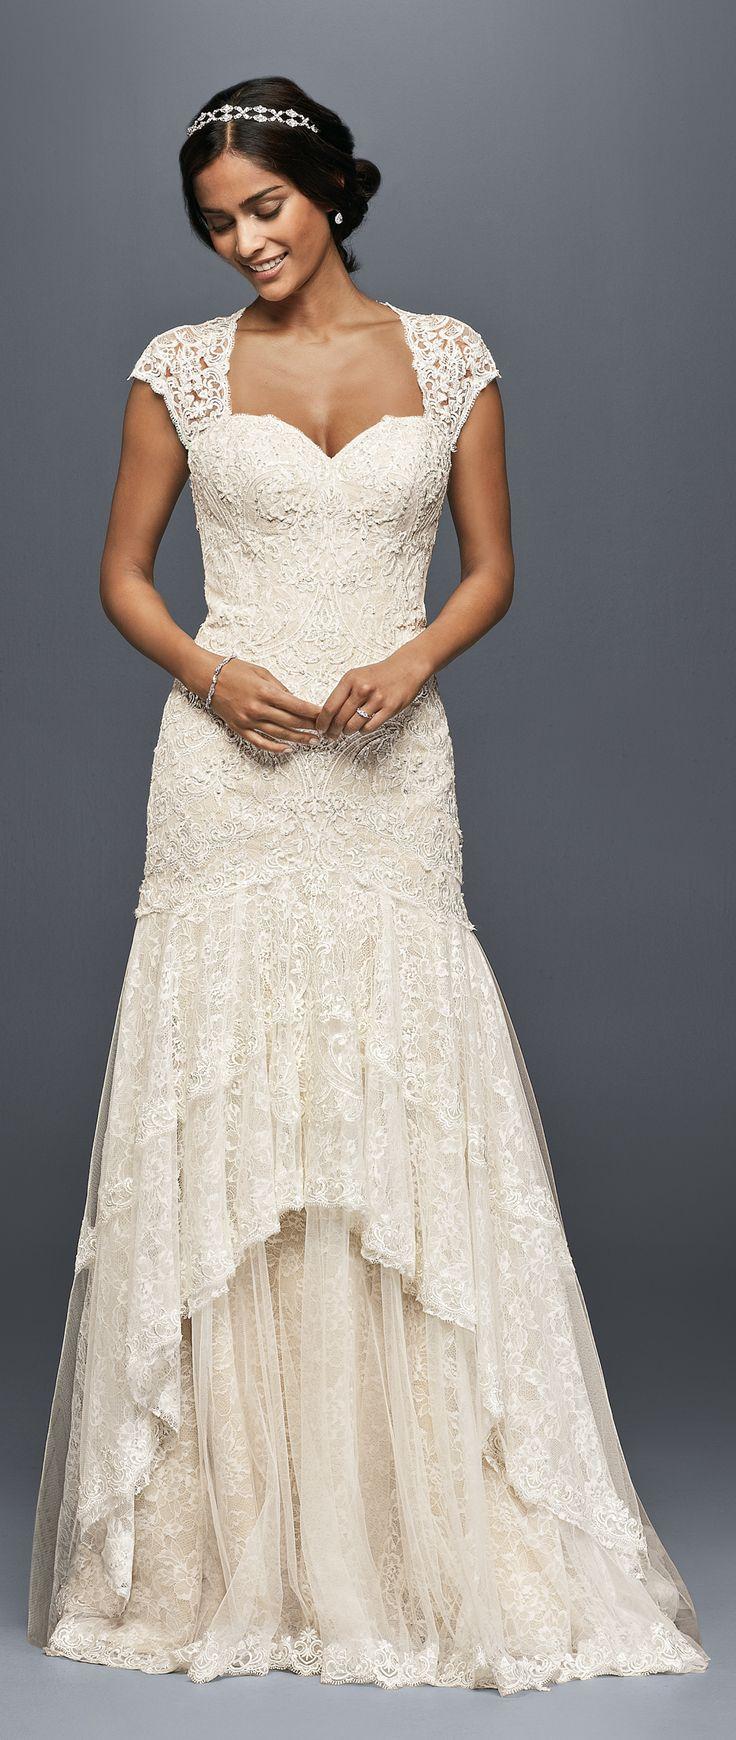 Tiered Lace Mermaid Wedding Dress with Beading David's